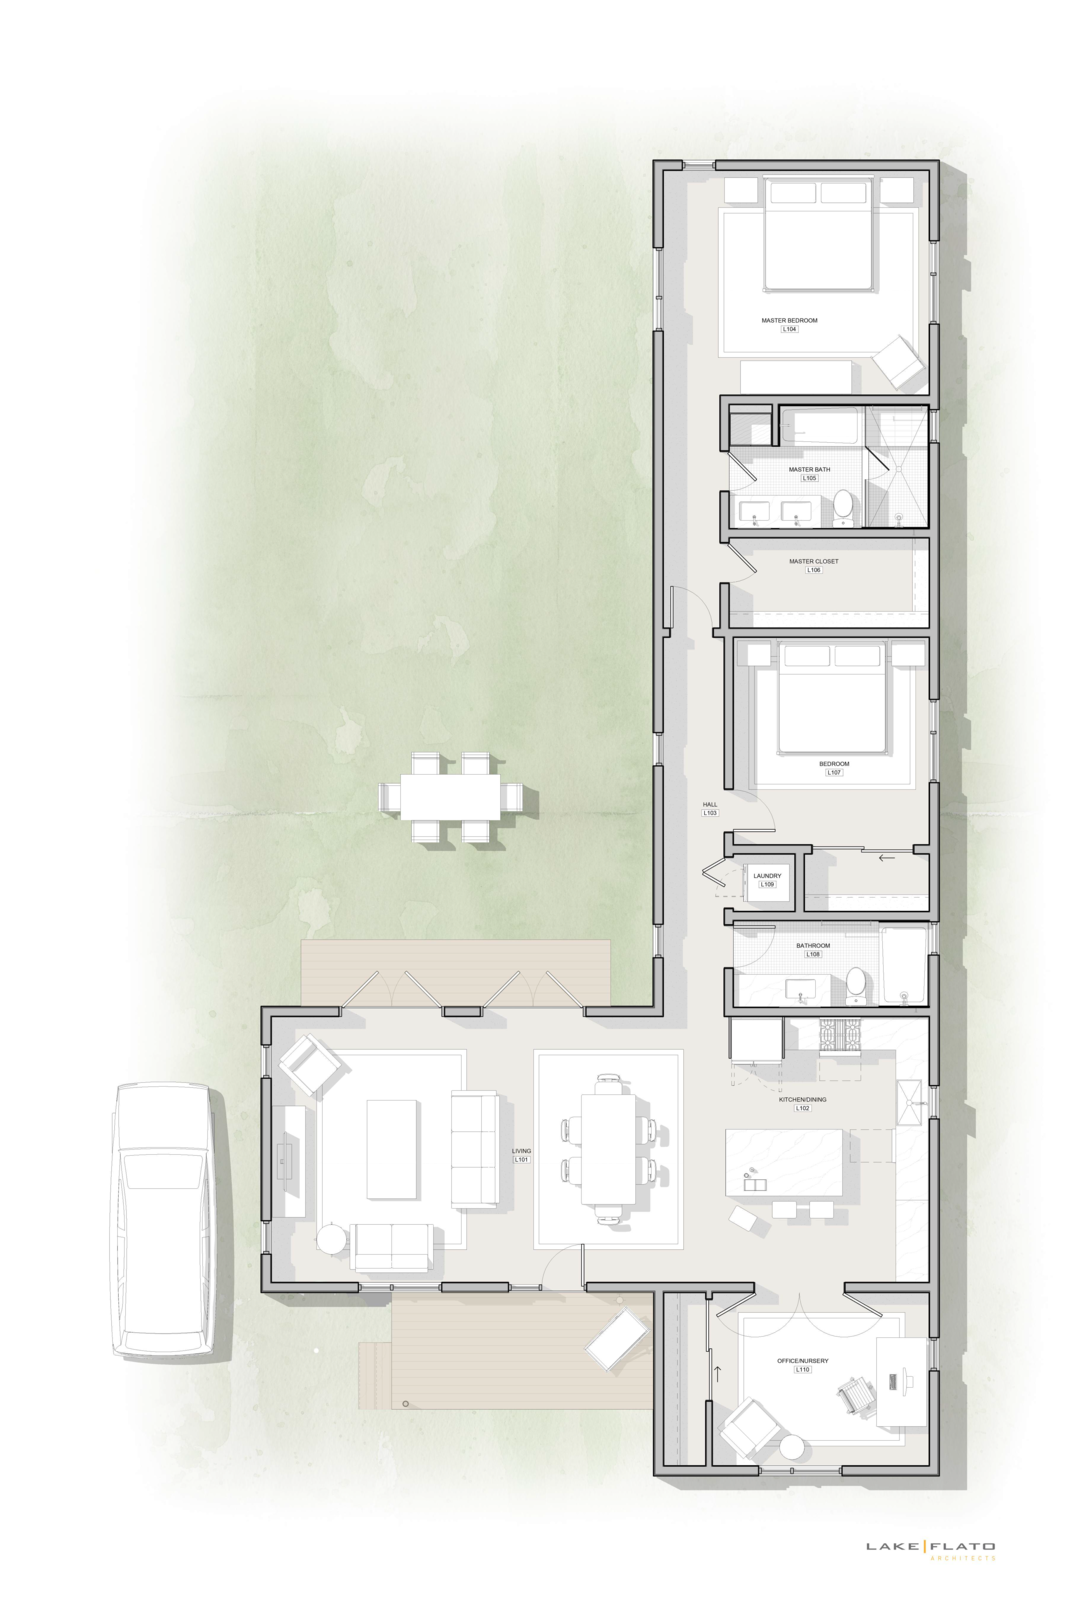 Haciendas by Lake Flato floor plan  Photo 15 of 17 in Lake Flato's Wellness-Focused Haciendas in Dallas Start at $589K